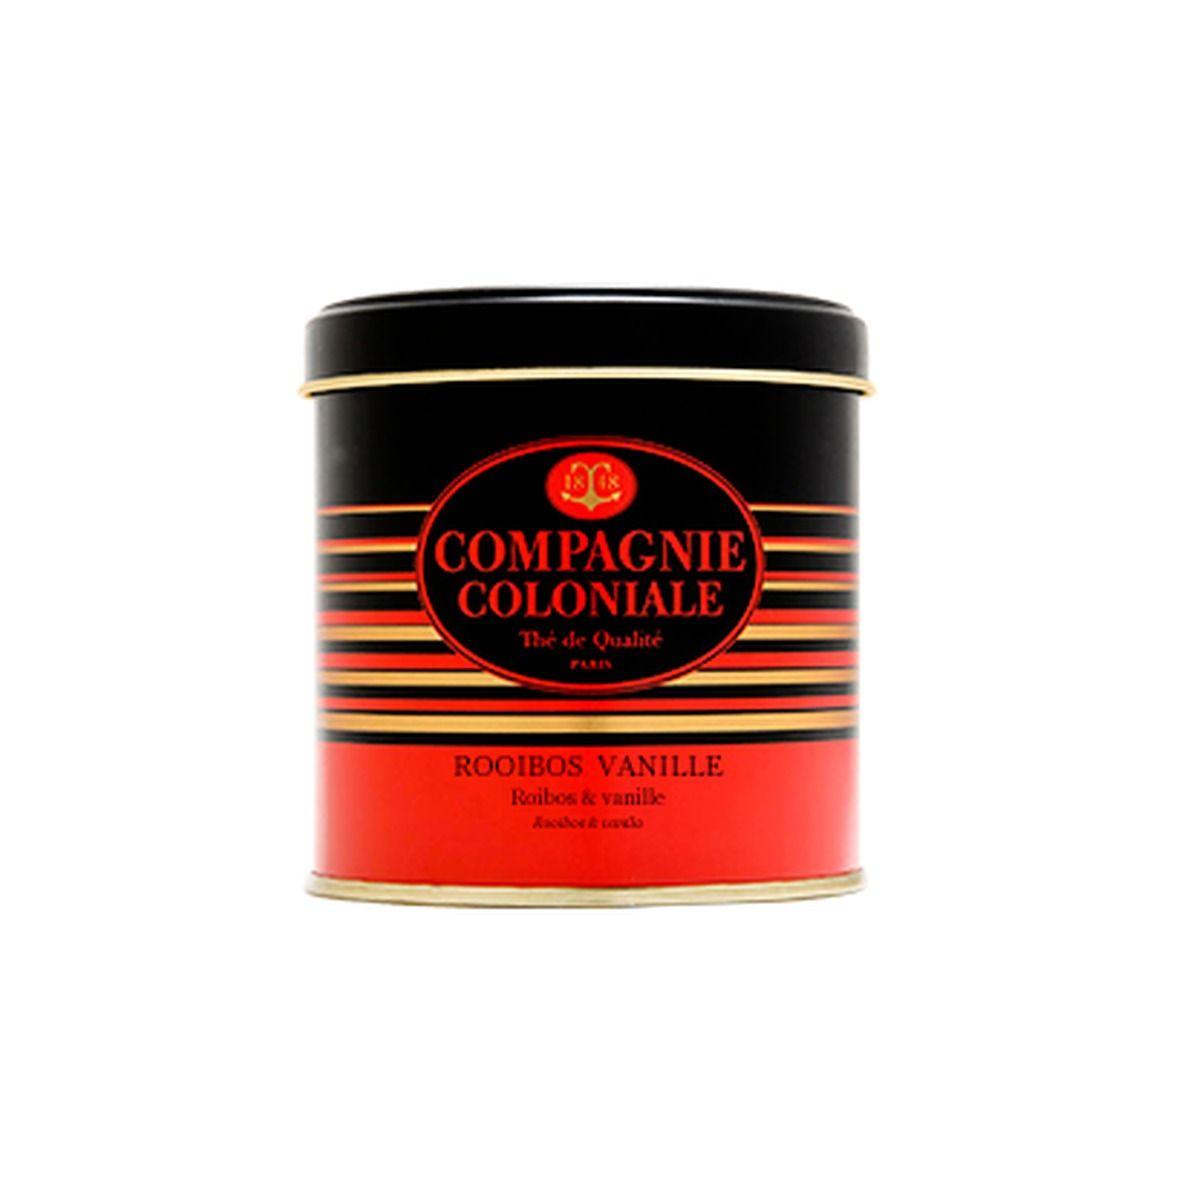 Rooibos Vanille boite métal 30g - Compagnie Coloniale